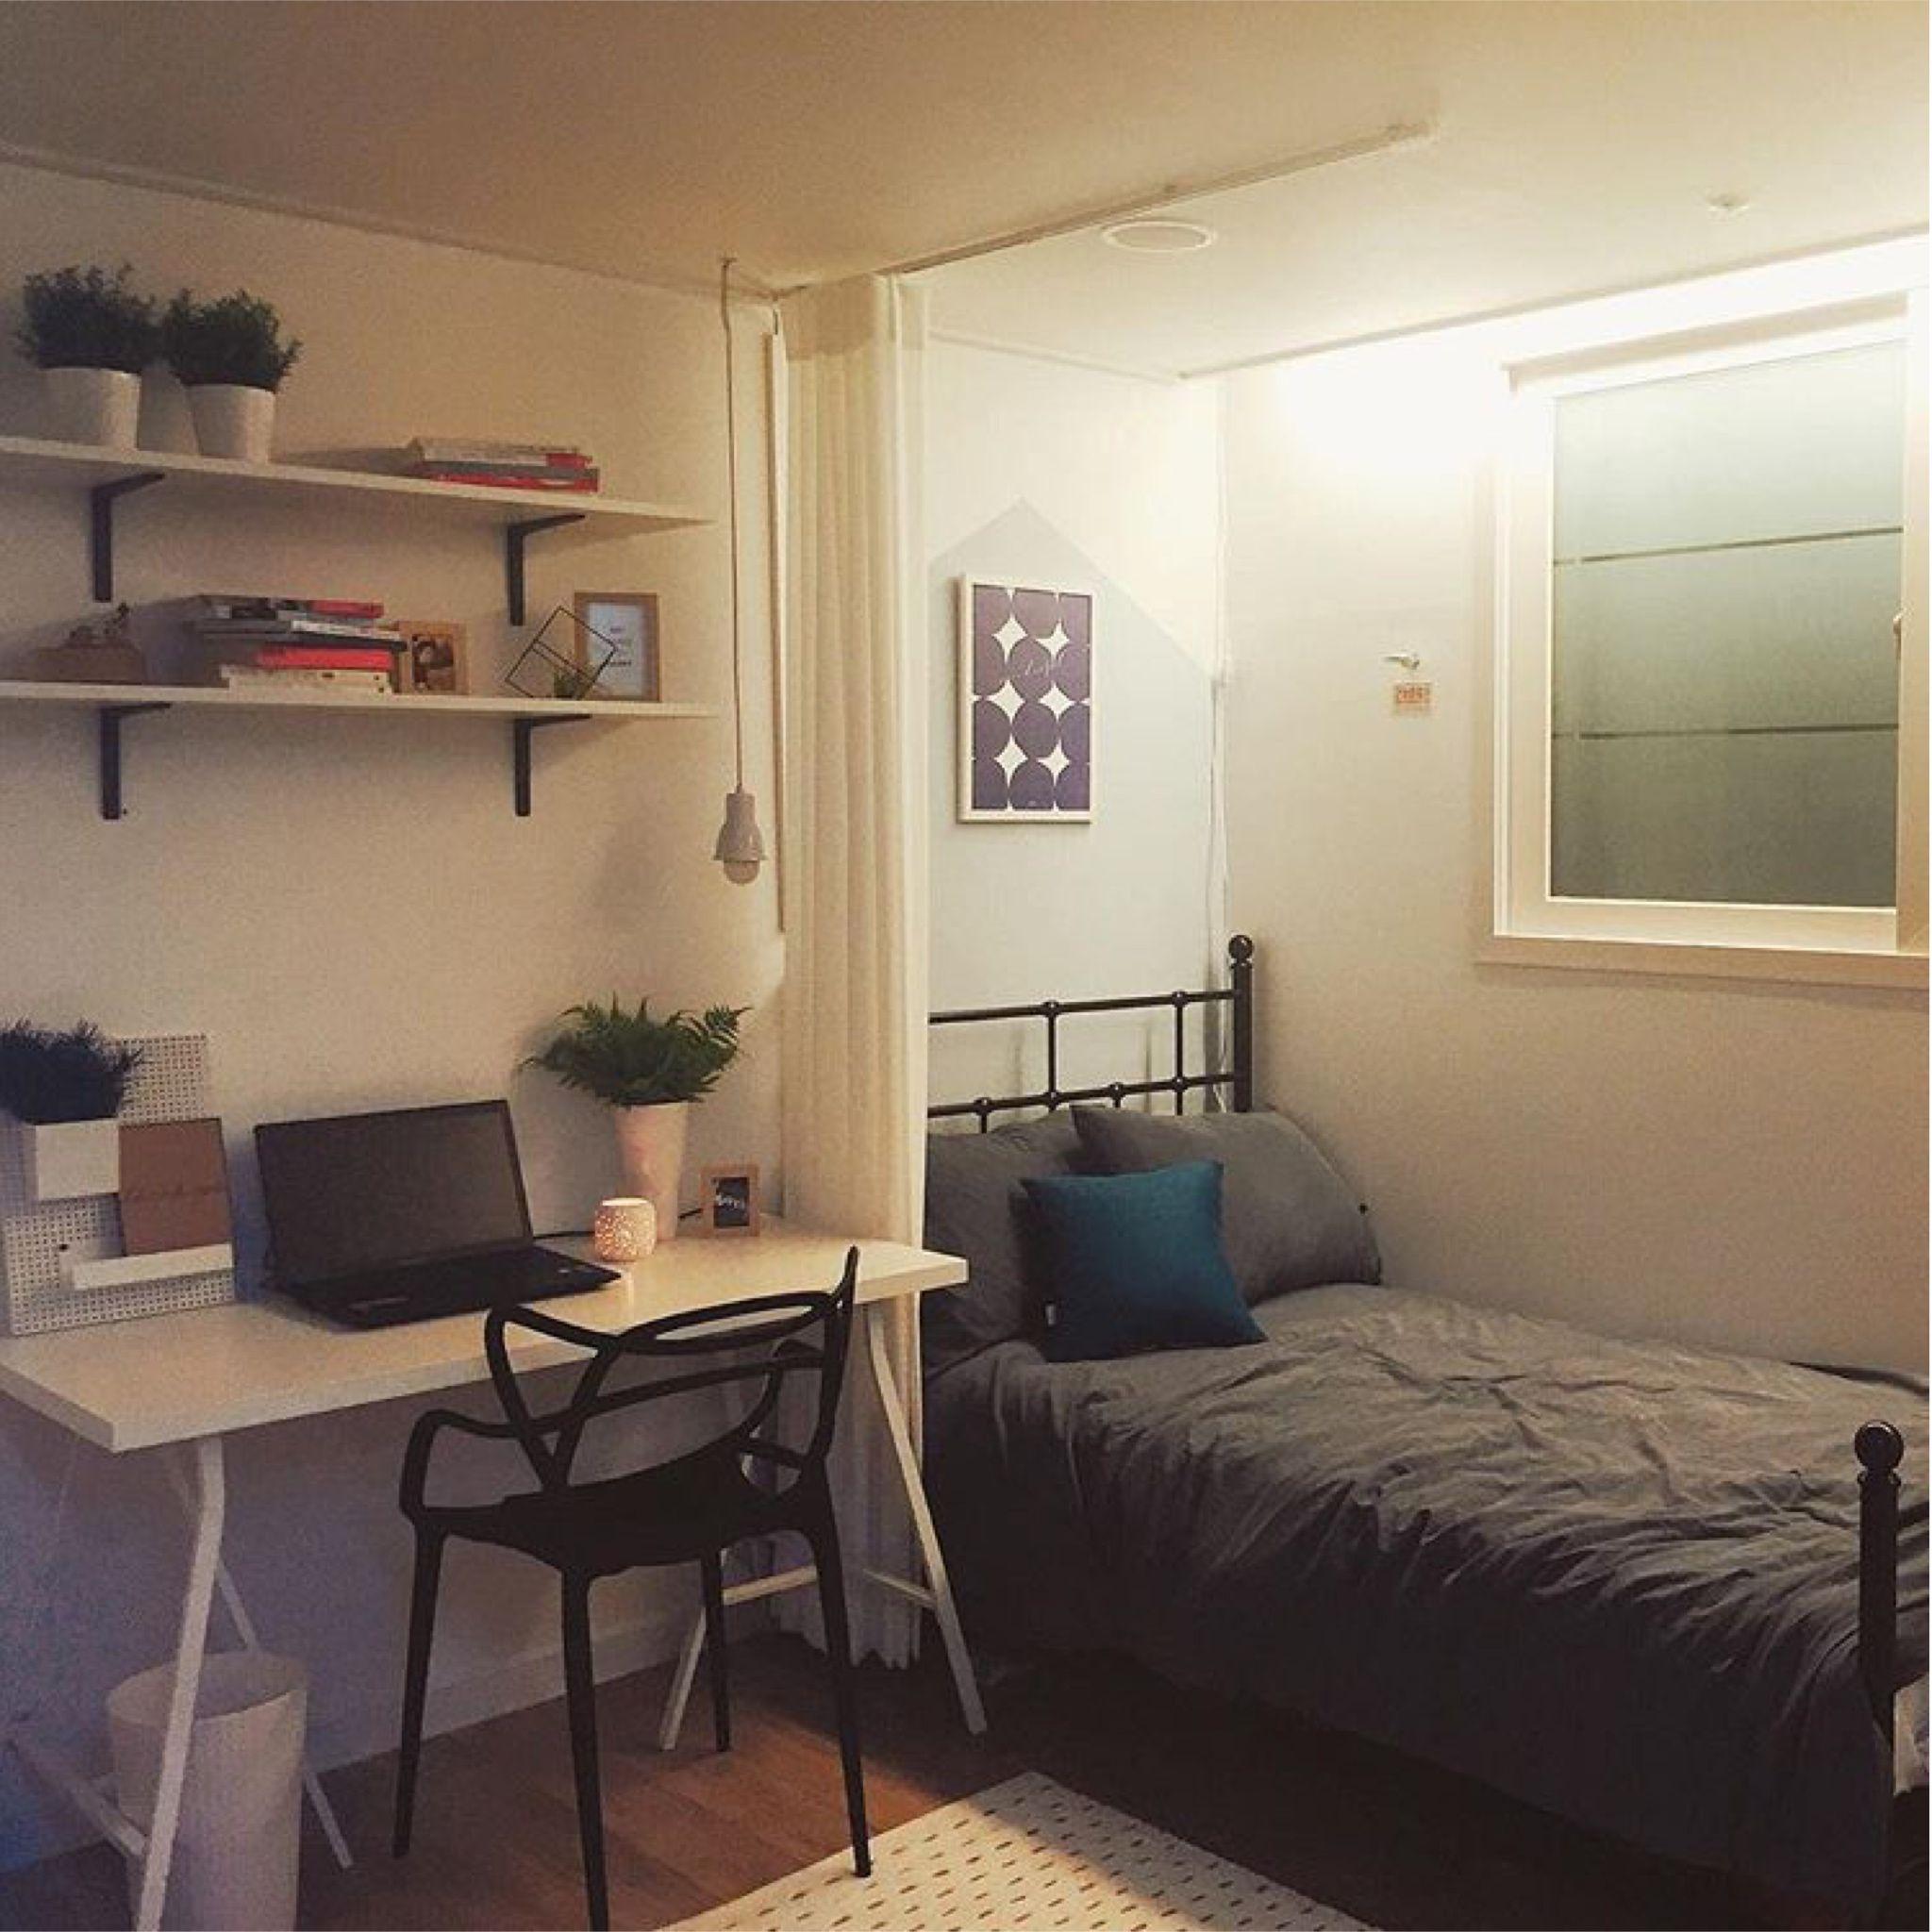 ˏˋ Pinterest Murlktea ˎˊ 一人暮らし部屋レイアウト インテリアデザイン 室内装飾